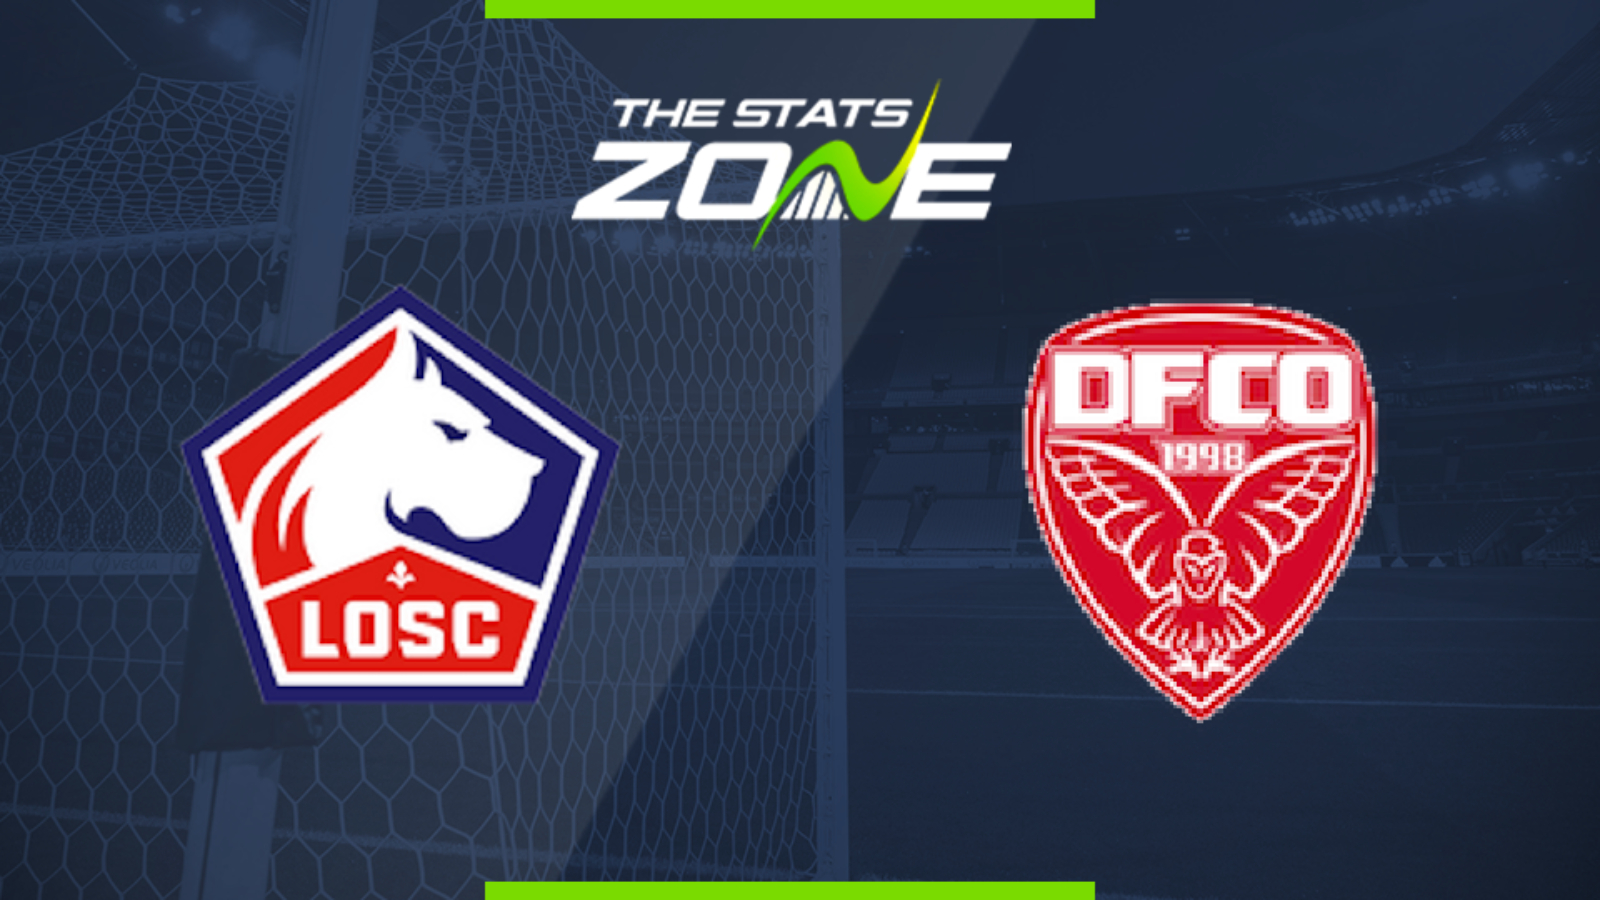 2019-20 Ligue 1 – Lille vs Dijon Preview & Prediction - The Stats Zone